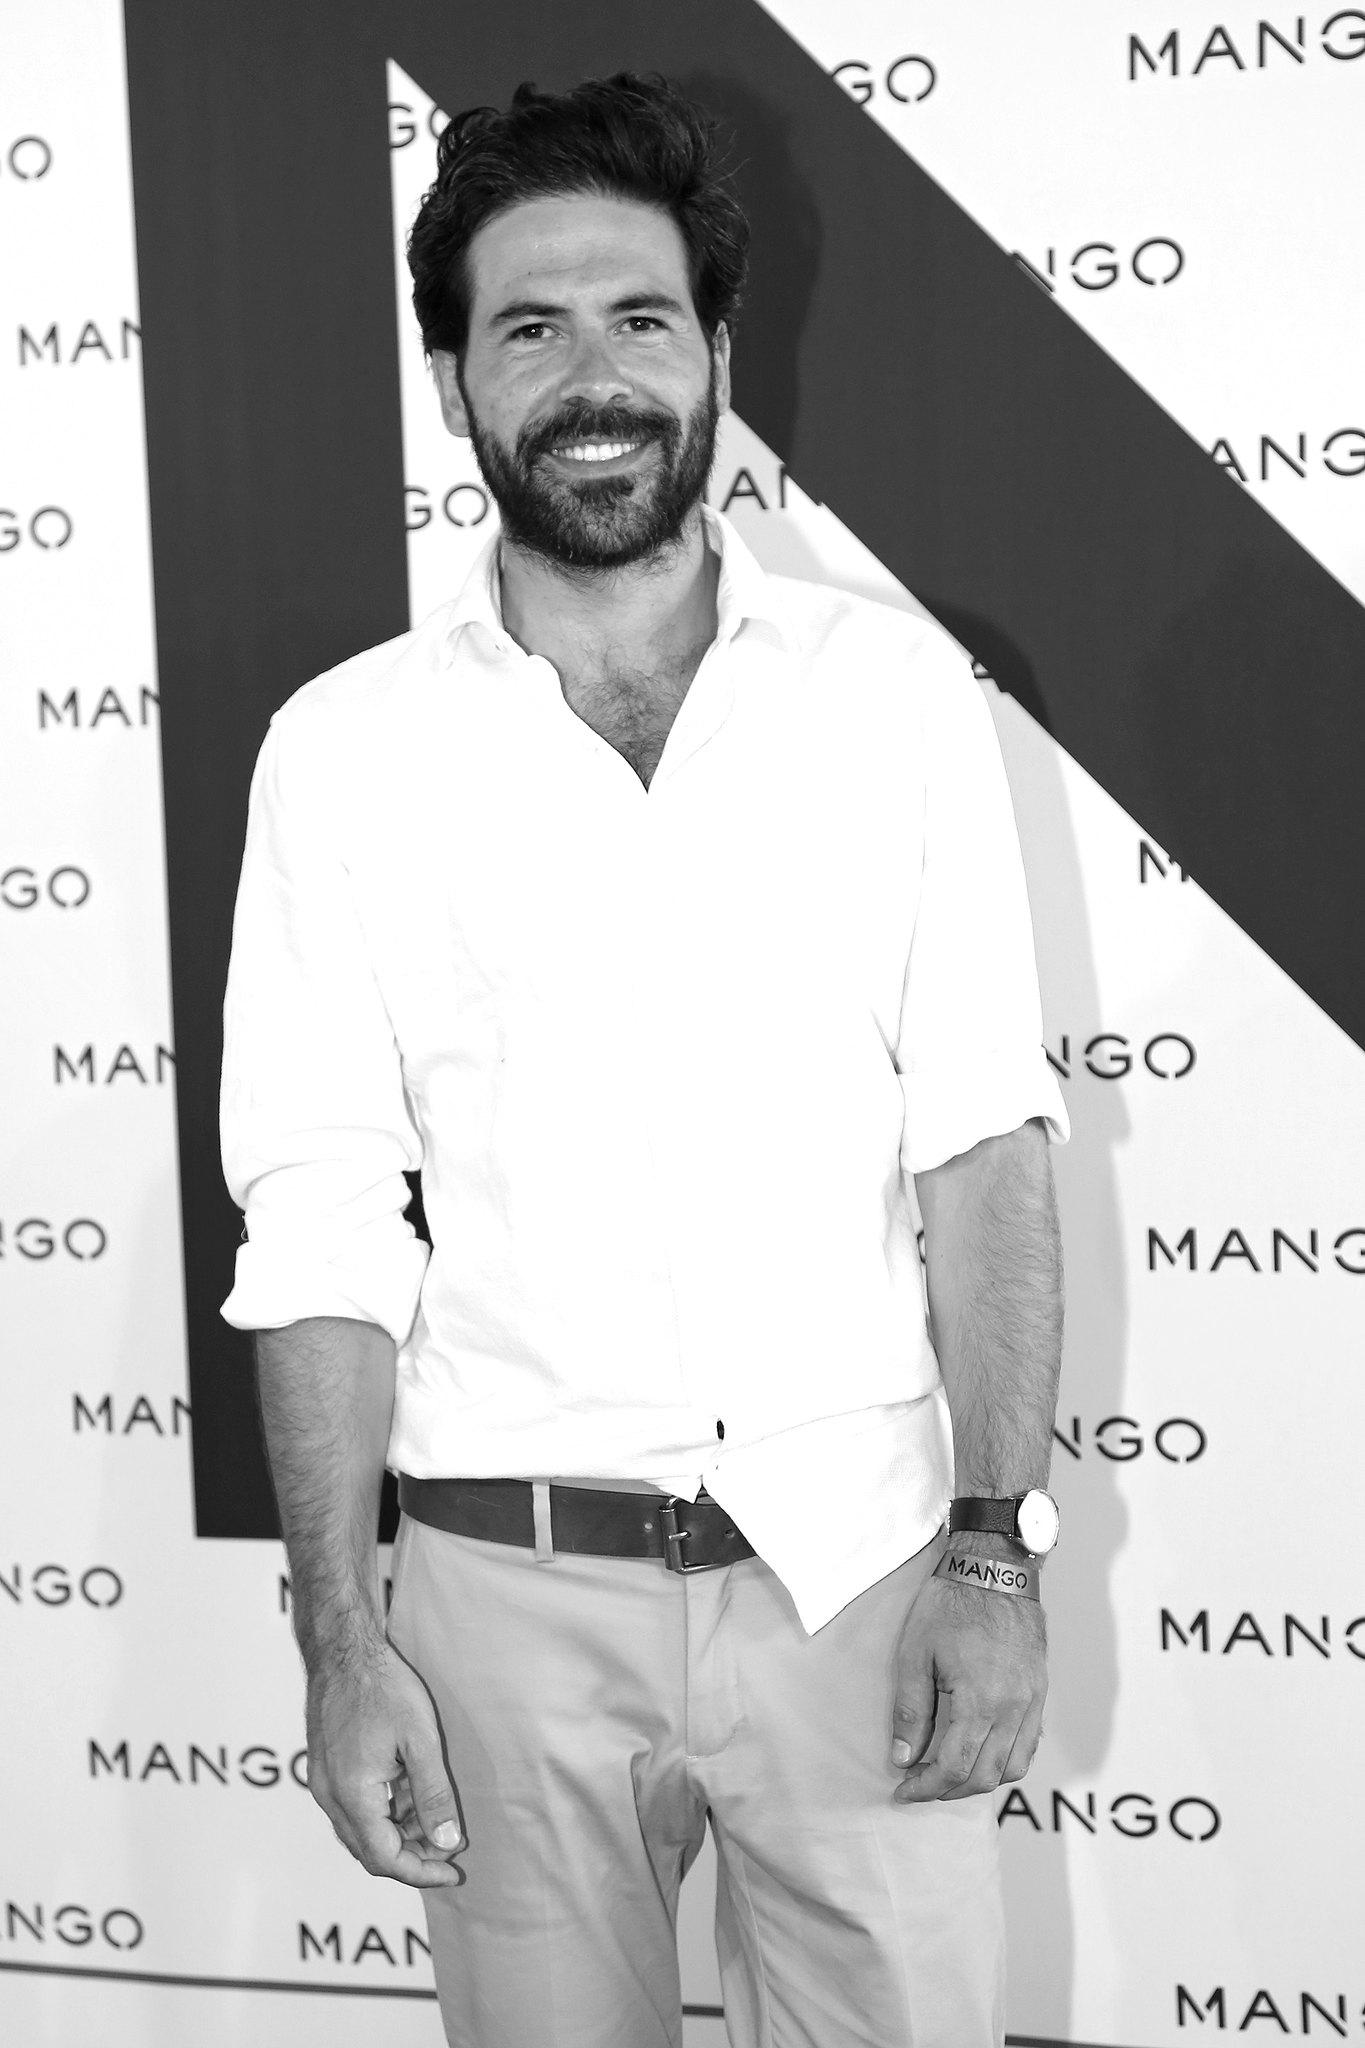 _miguel_carrizo_mango_fashion_show_photo_call_